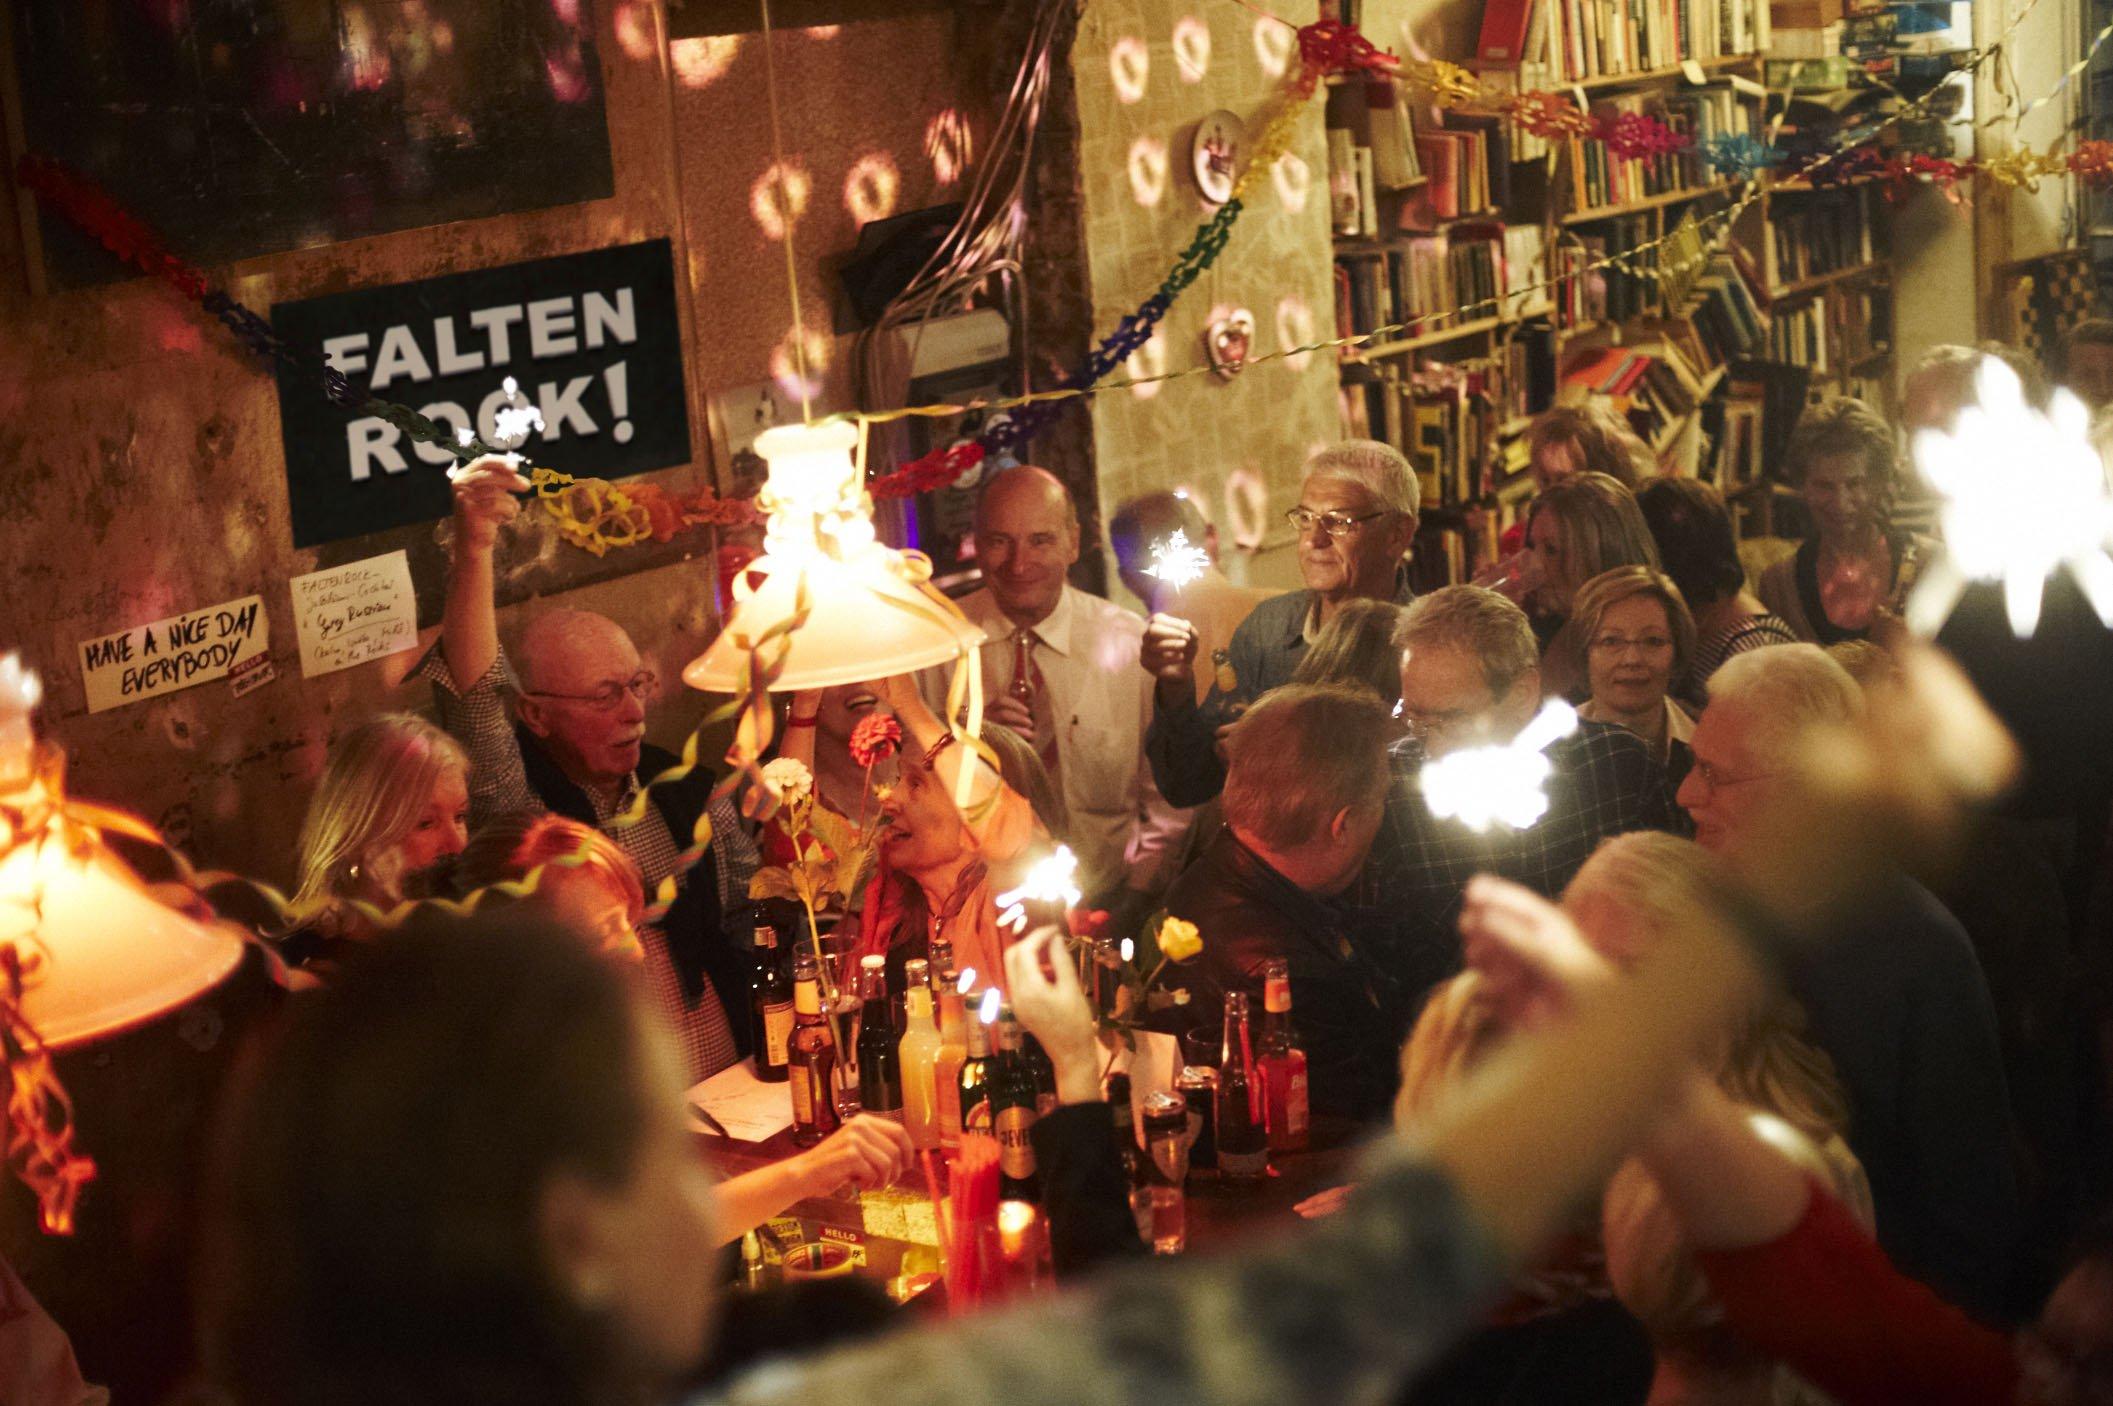 Faltenrock Ü60 Party in Hamburg, Party, 09.06.2018, TANGO matrix - Copyright Franziska Holz